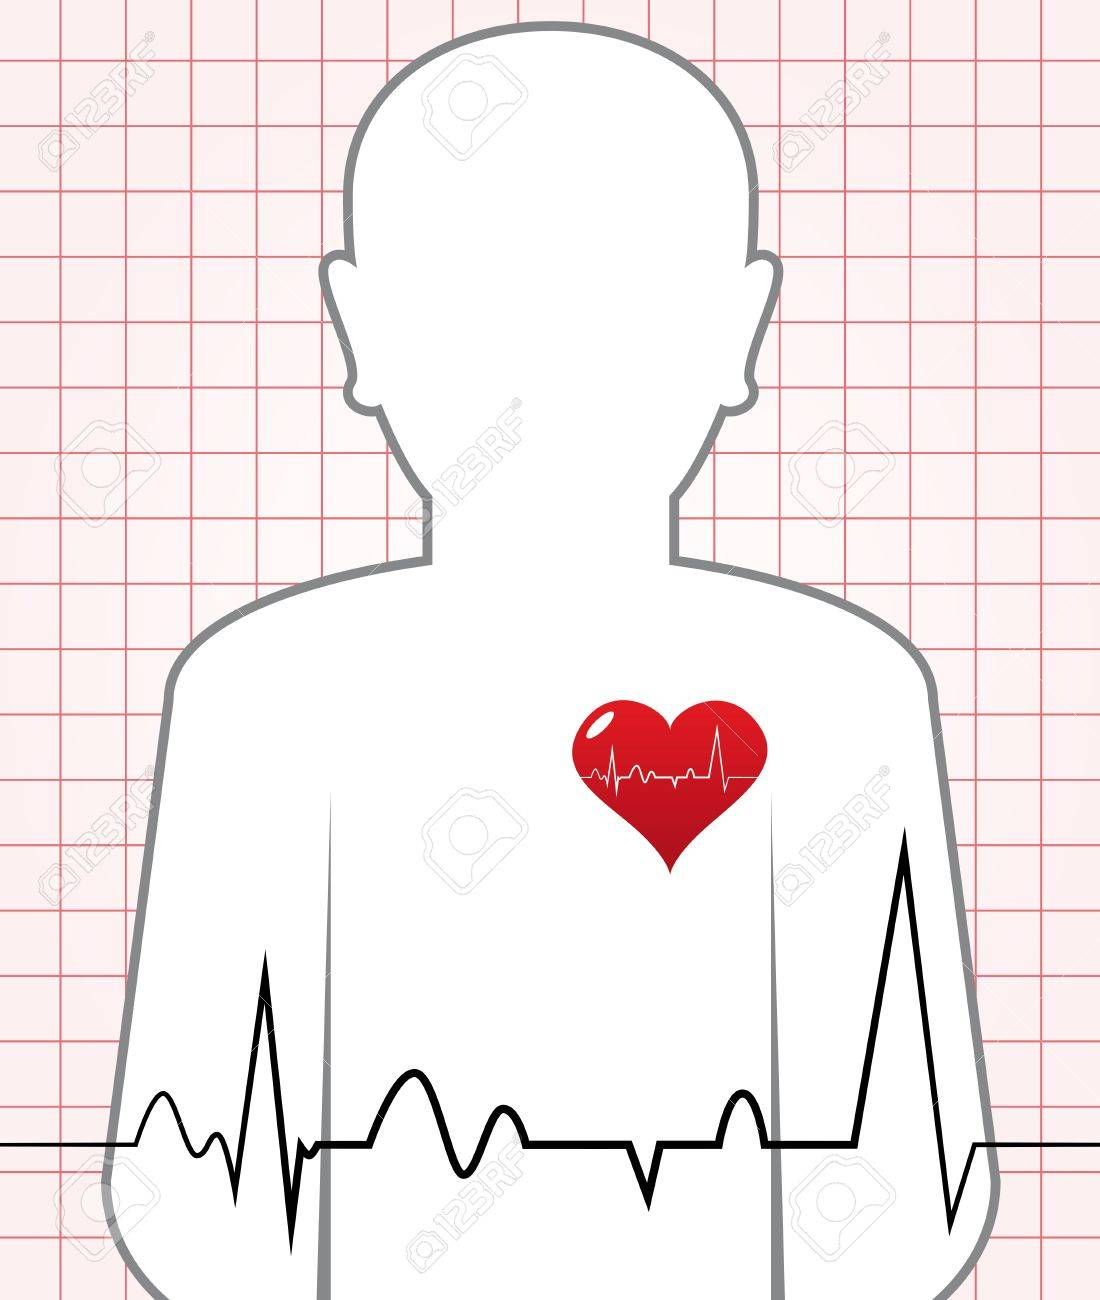 Abstract Human Heart Beat Chart